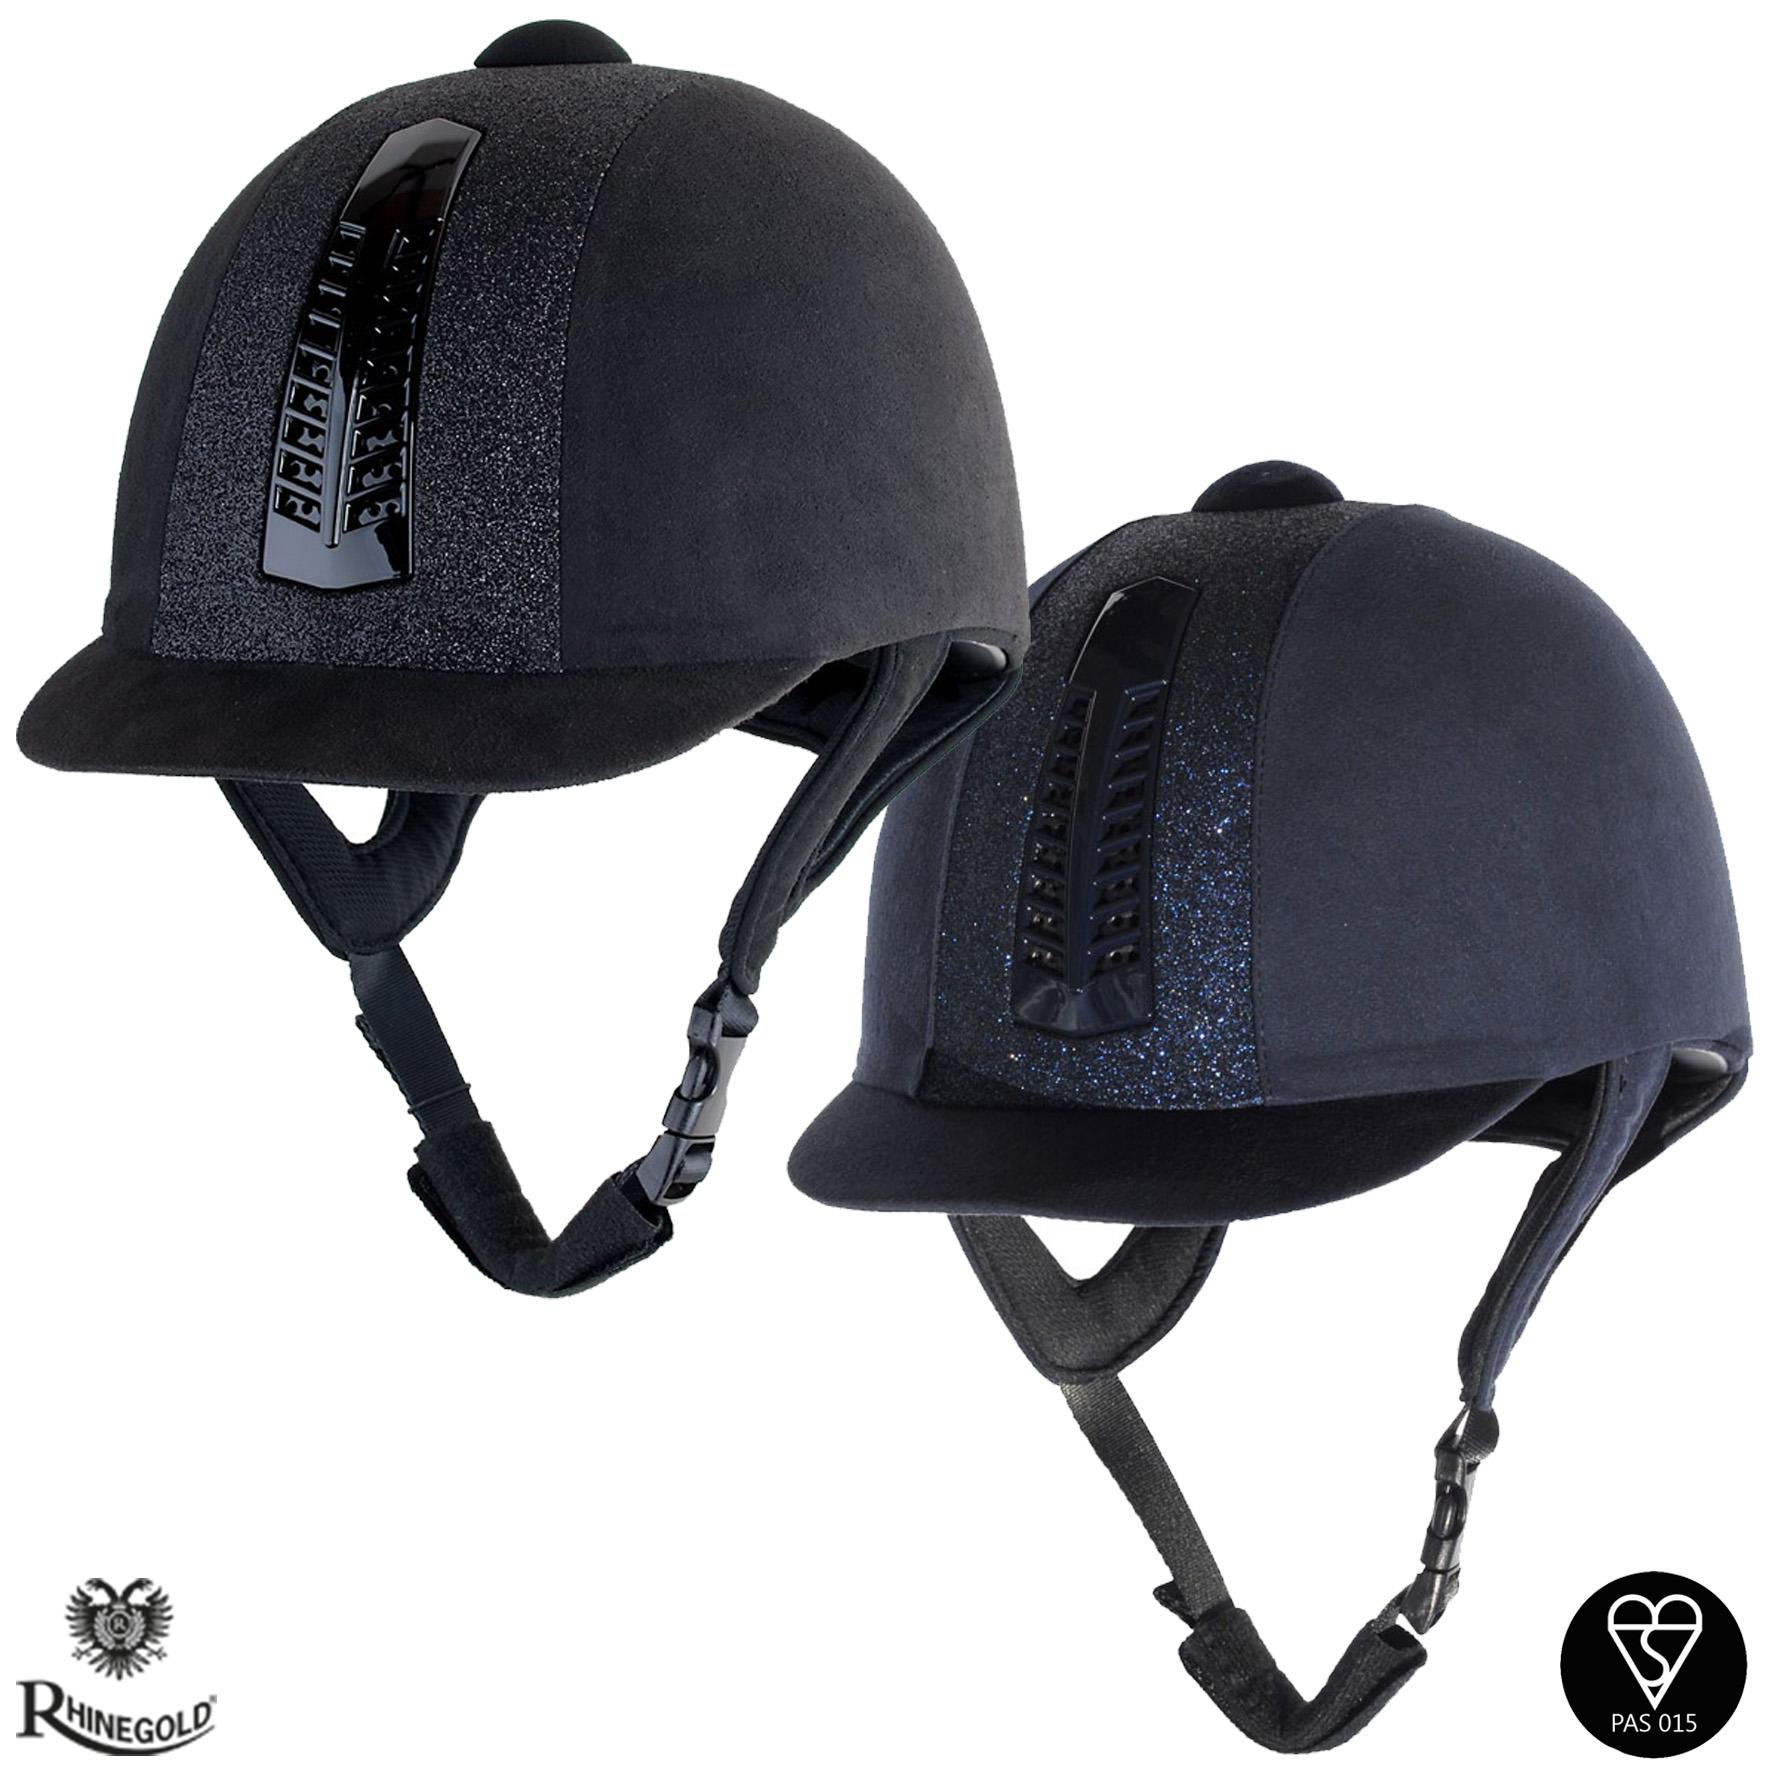 Rhinegold Glitter 'Pro' Riding Hat